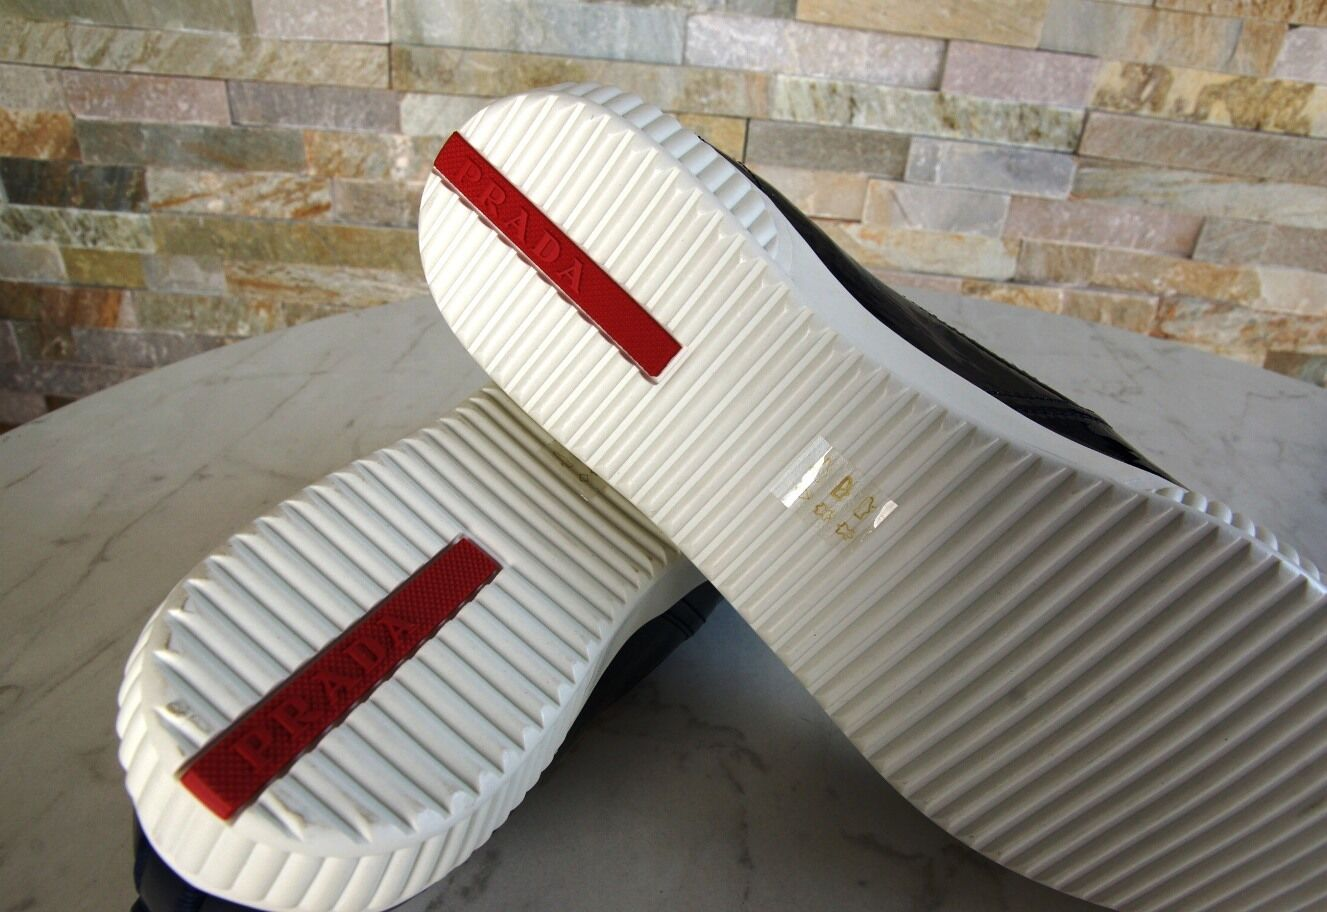 PRADA Gr 38,5 Slipper Mokassins royal Slip-On Schuhe schuhe 3S5952 royal Mokassins blau eb0841